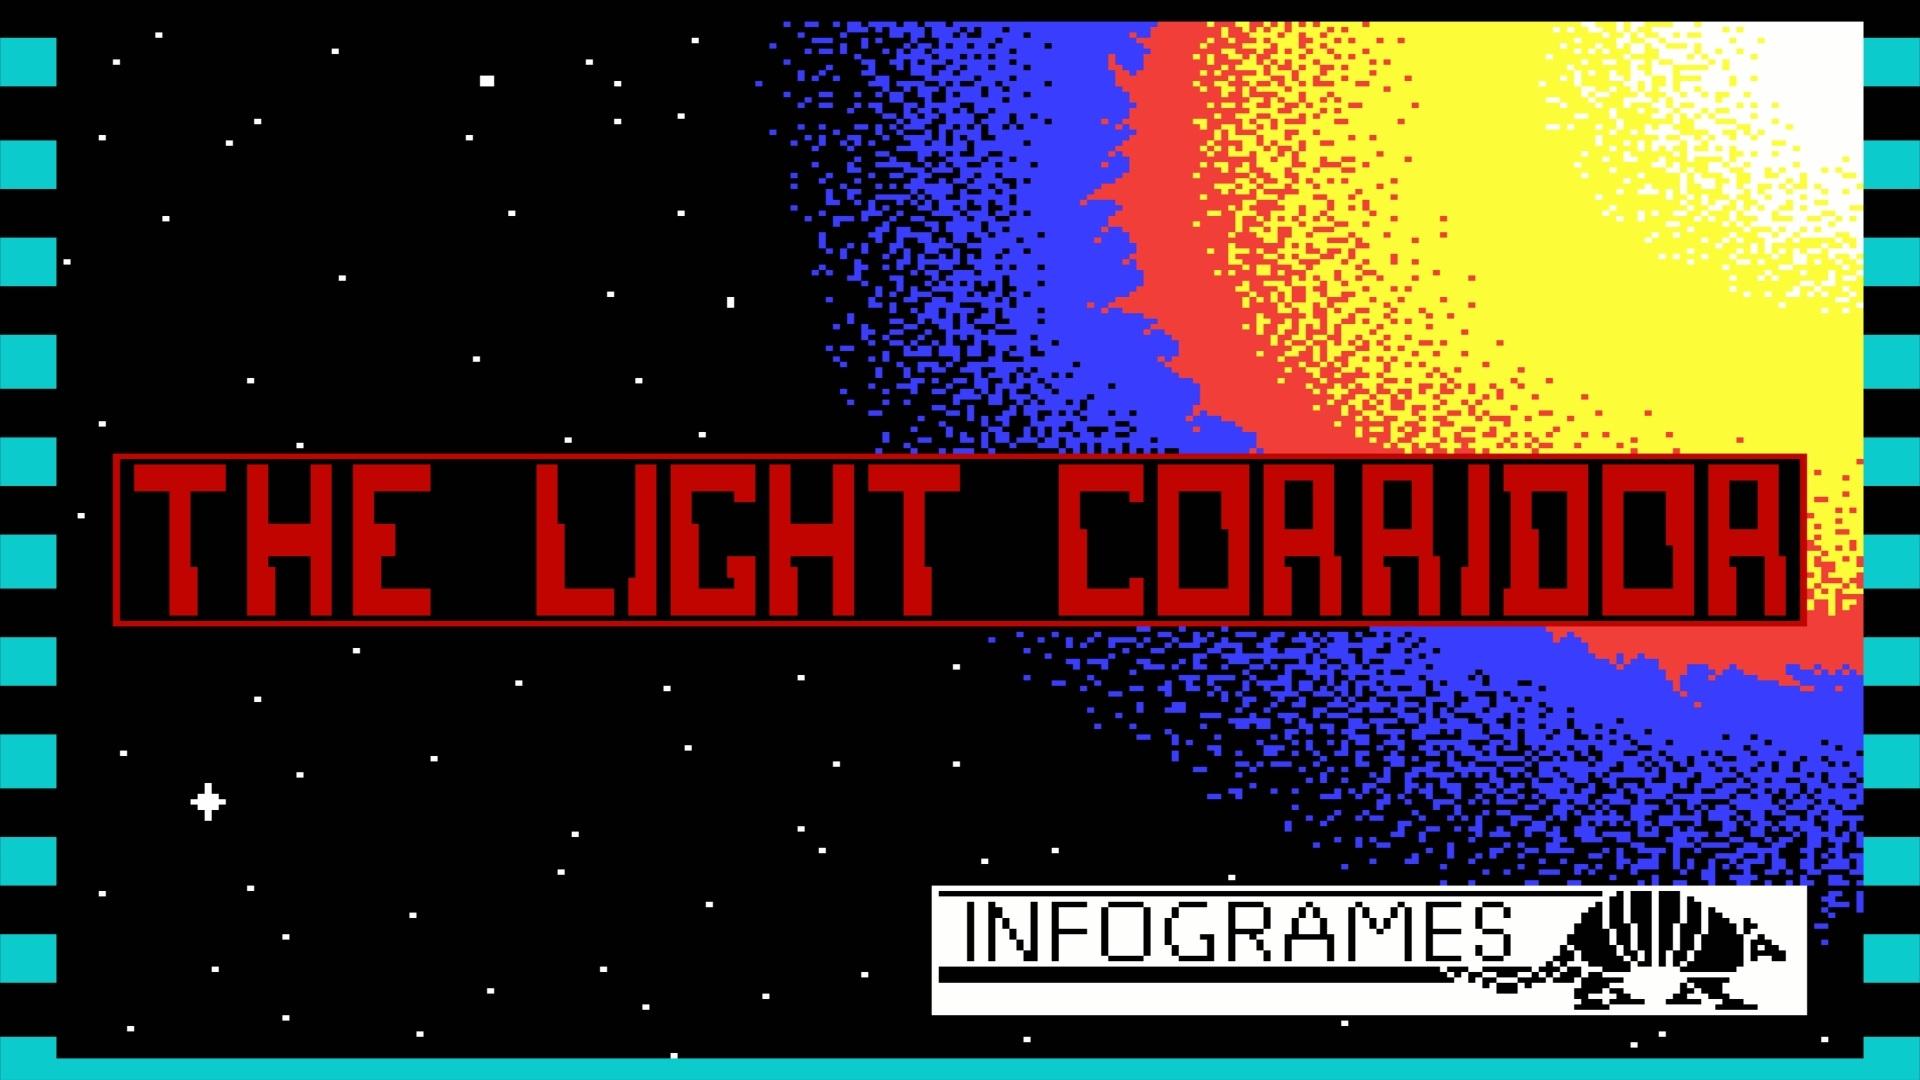 The Light Corridor ZX Spectrum Loading Screen